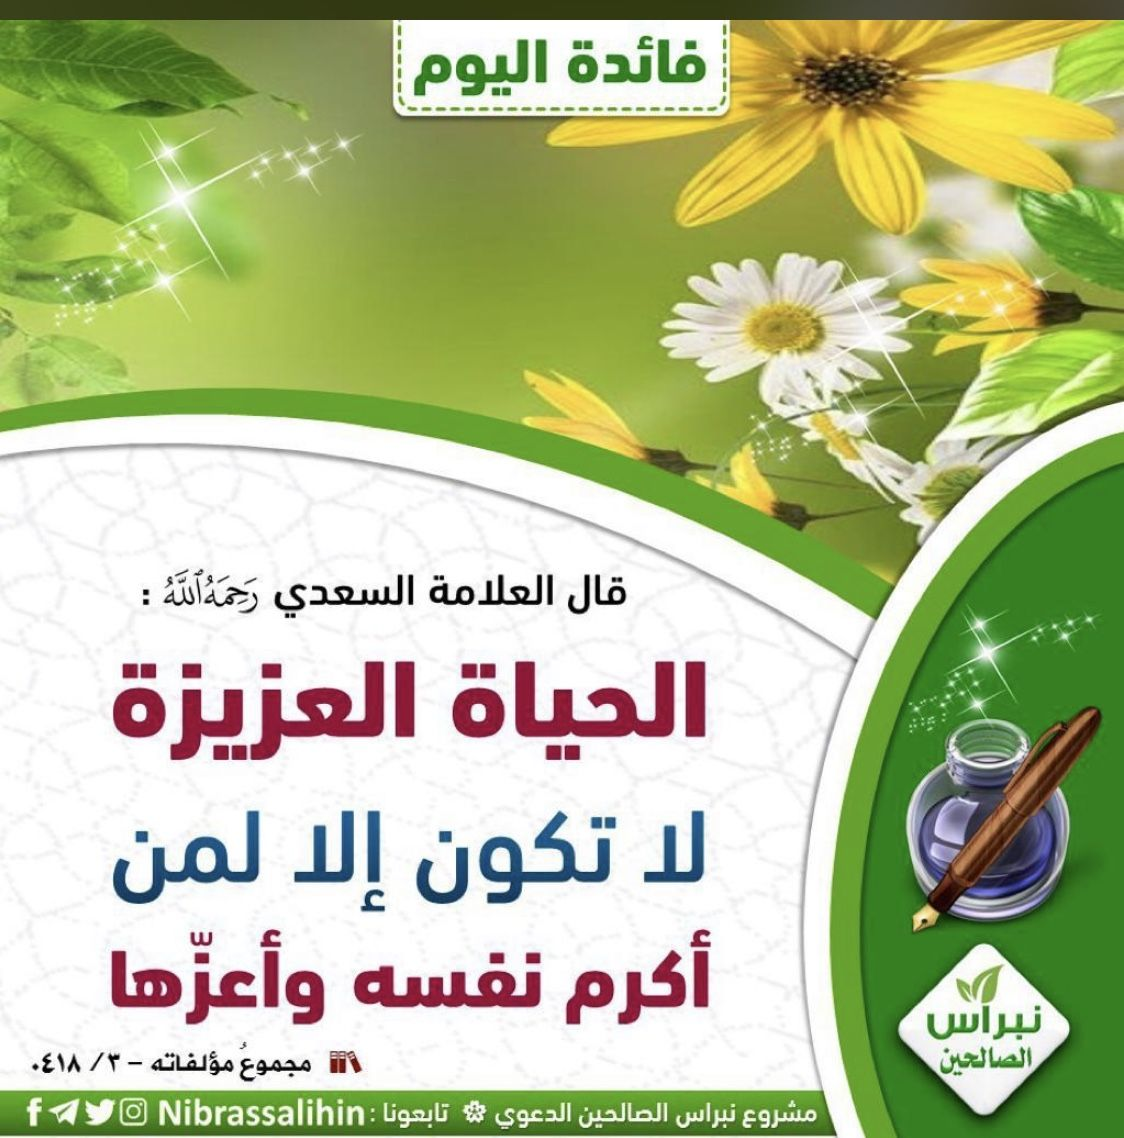 Pin By يحيى تركو On 0 صور أغاني أفلام Calligraphy Arabic Calligraphy